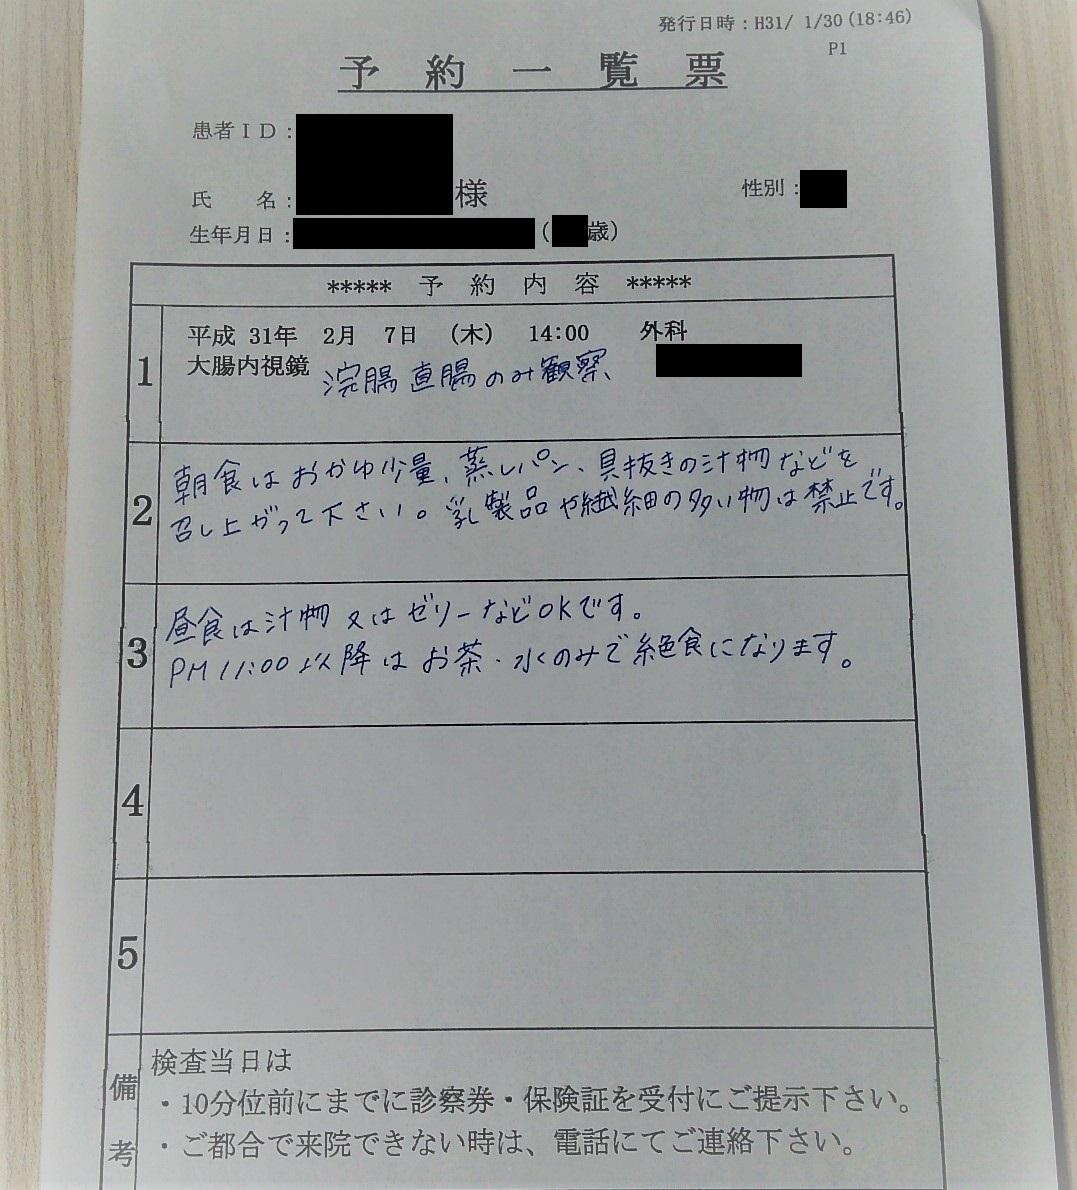 f:id:yotsumao:20190702062305j:plain